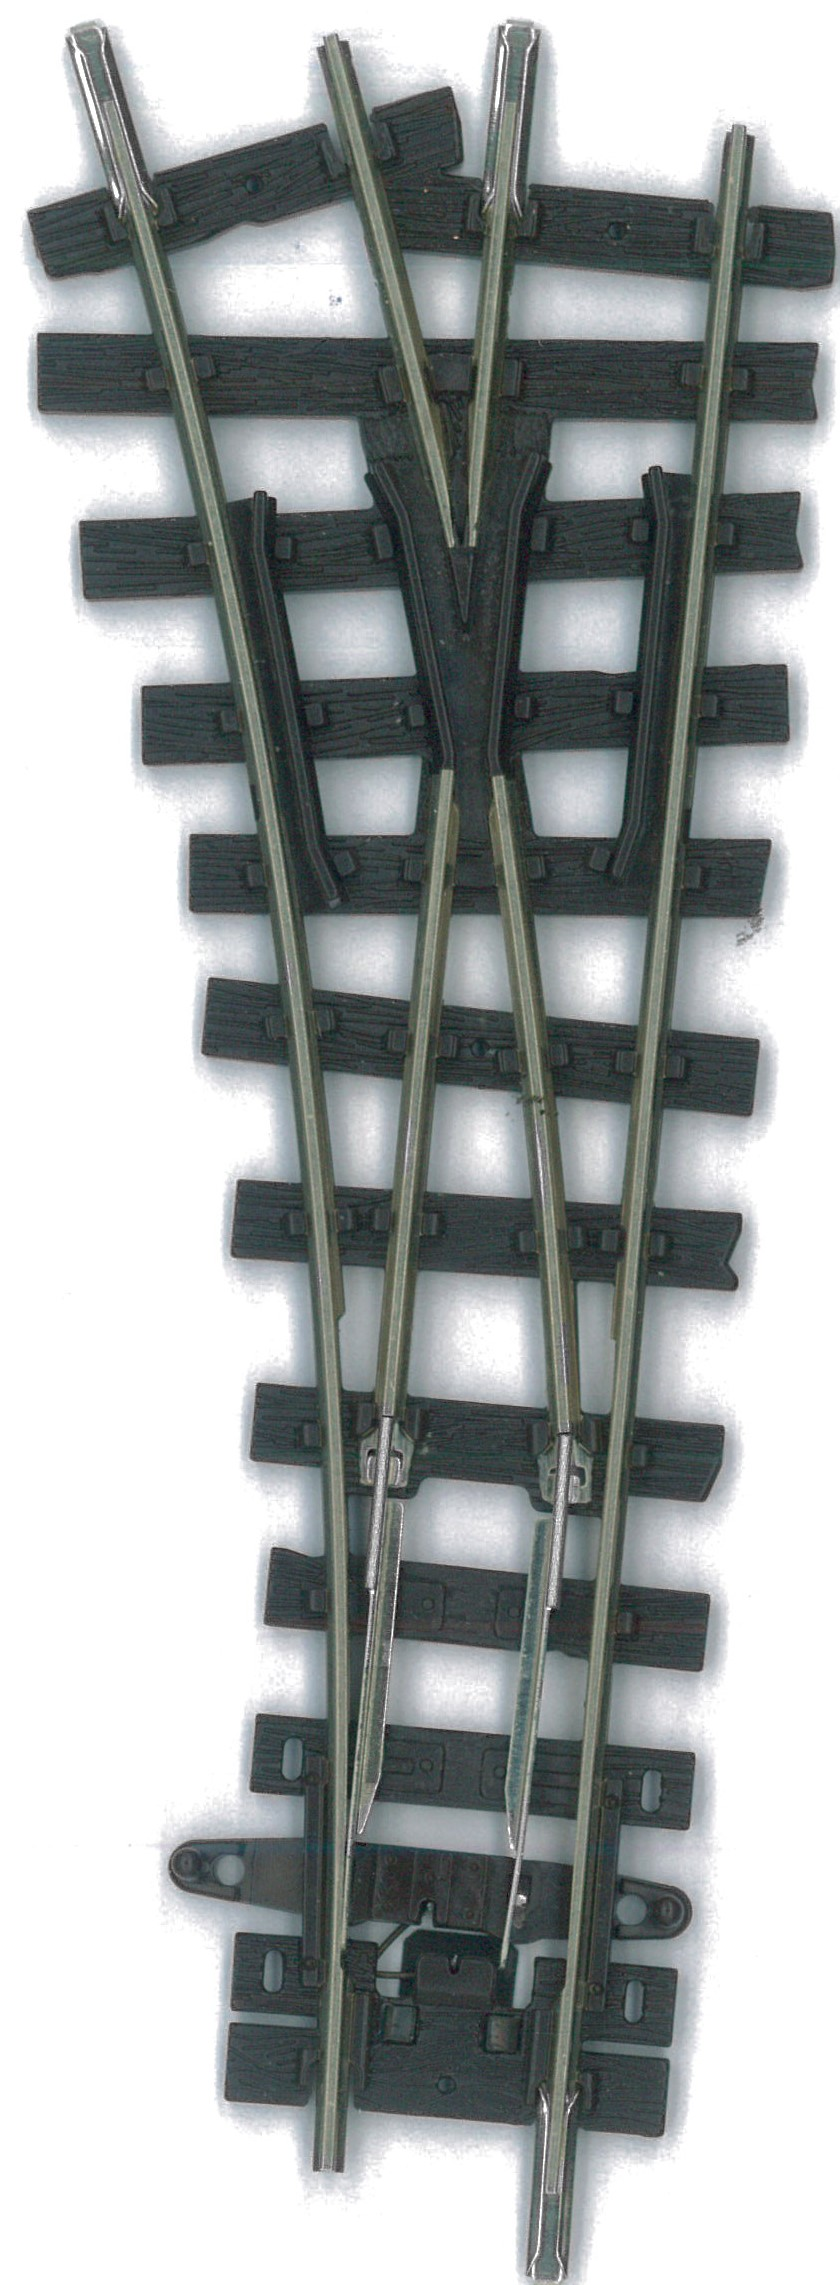 H0e Weiche kurz links, R=228mm - Peco  | günstig bestellen bei Weinert-Bauteile